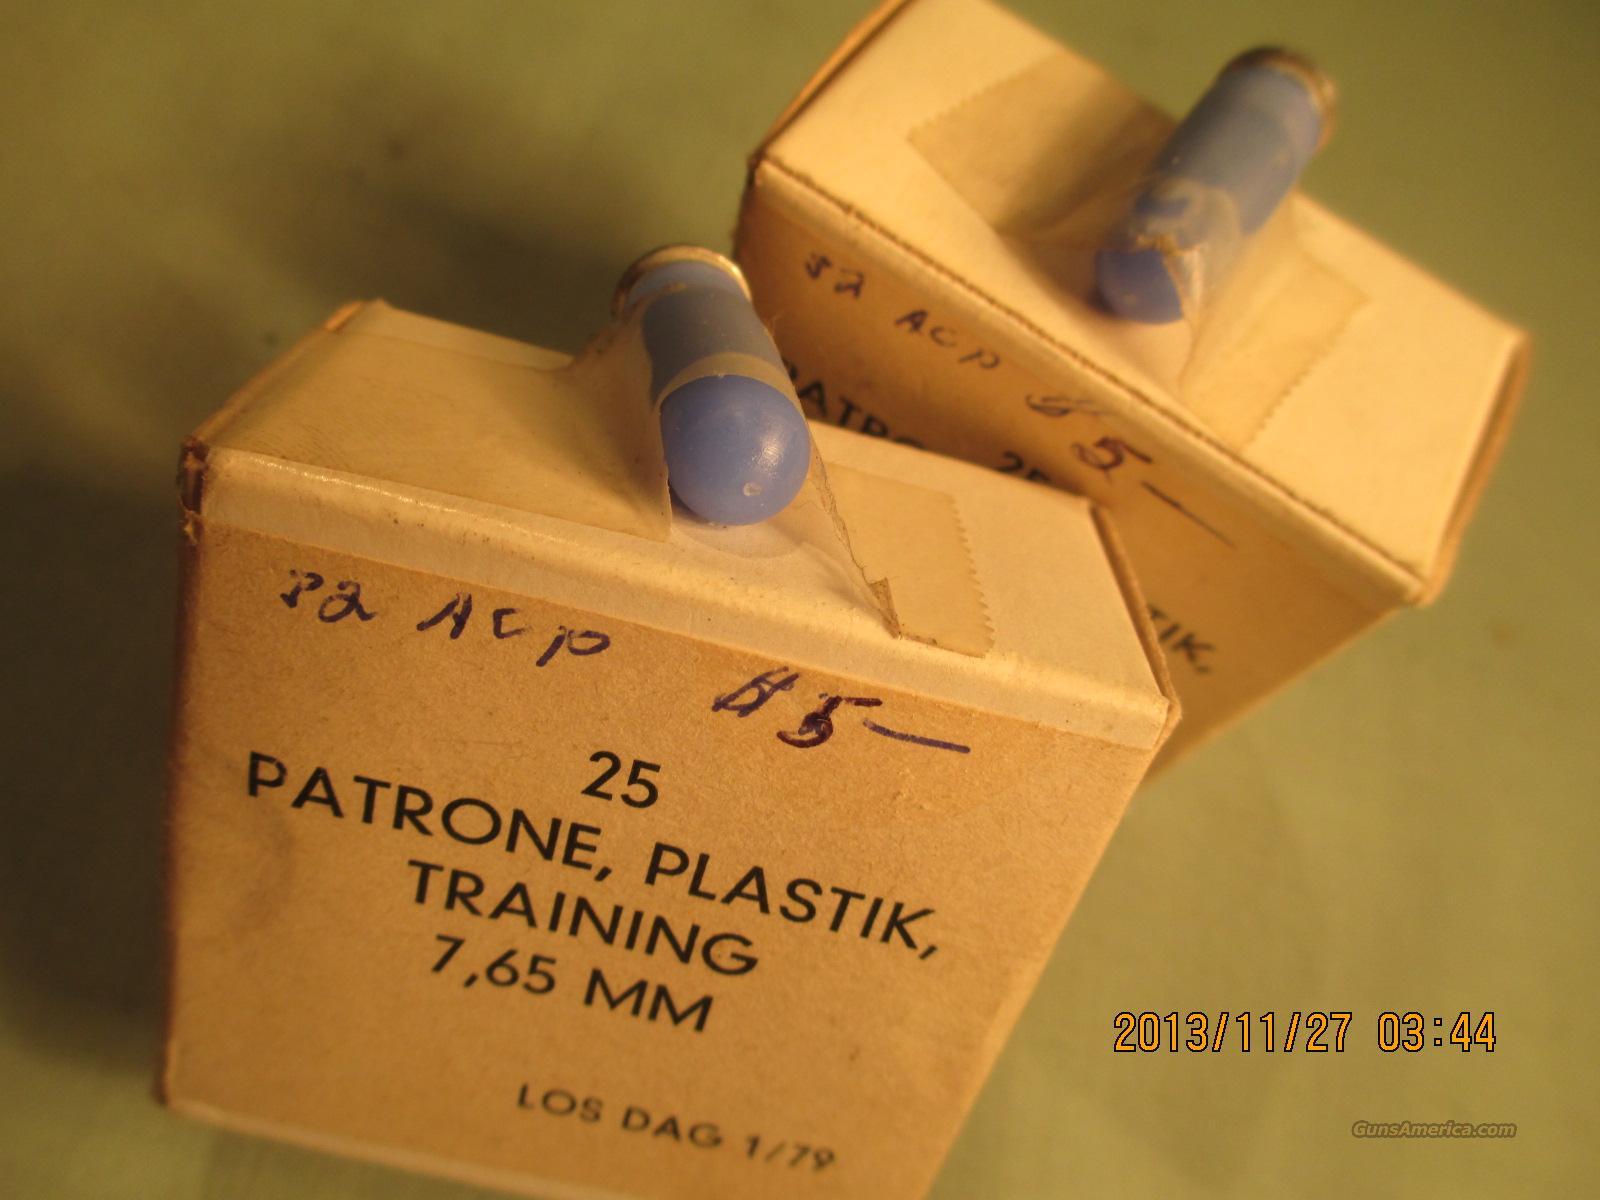 7.65 MM TRAINING PLASTIC 50 ROUNDS  Non-Guns > Ammunition